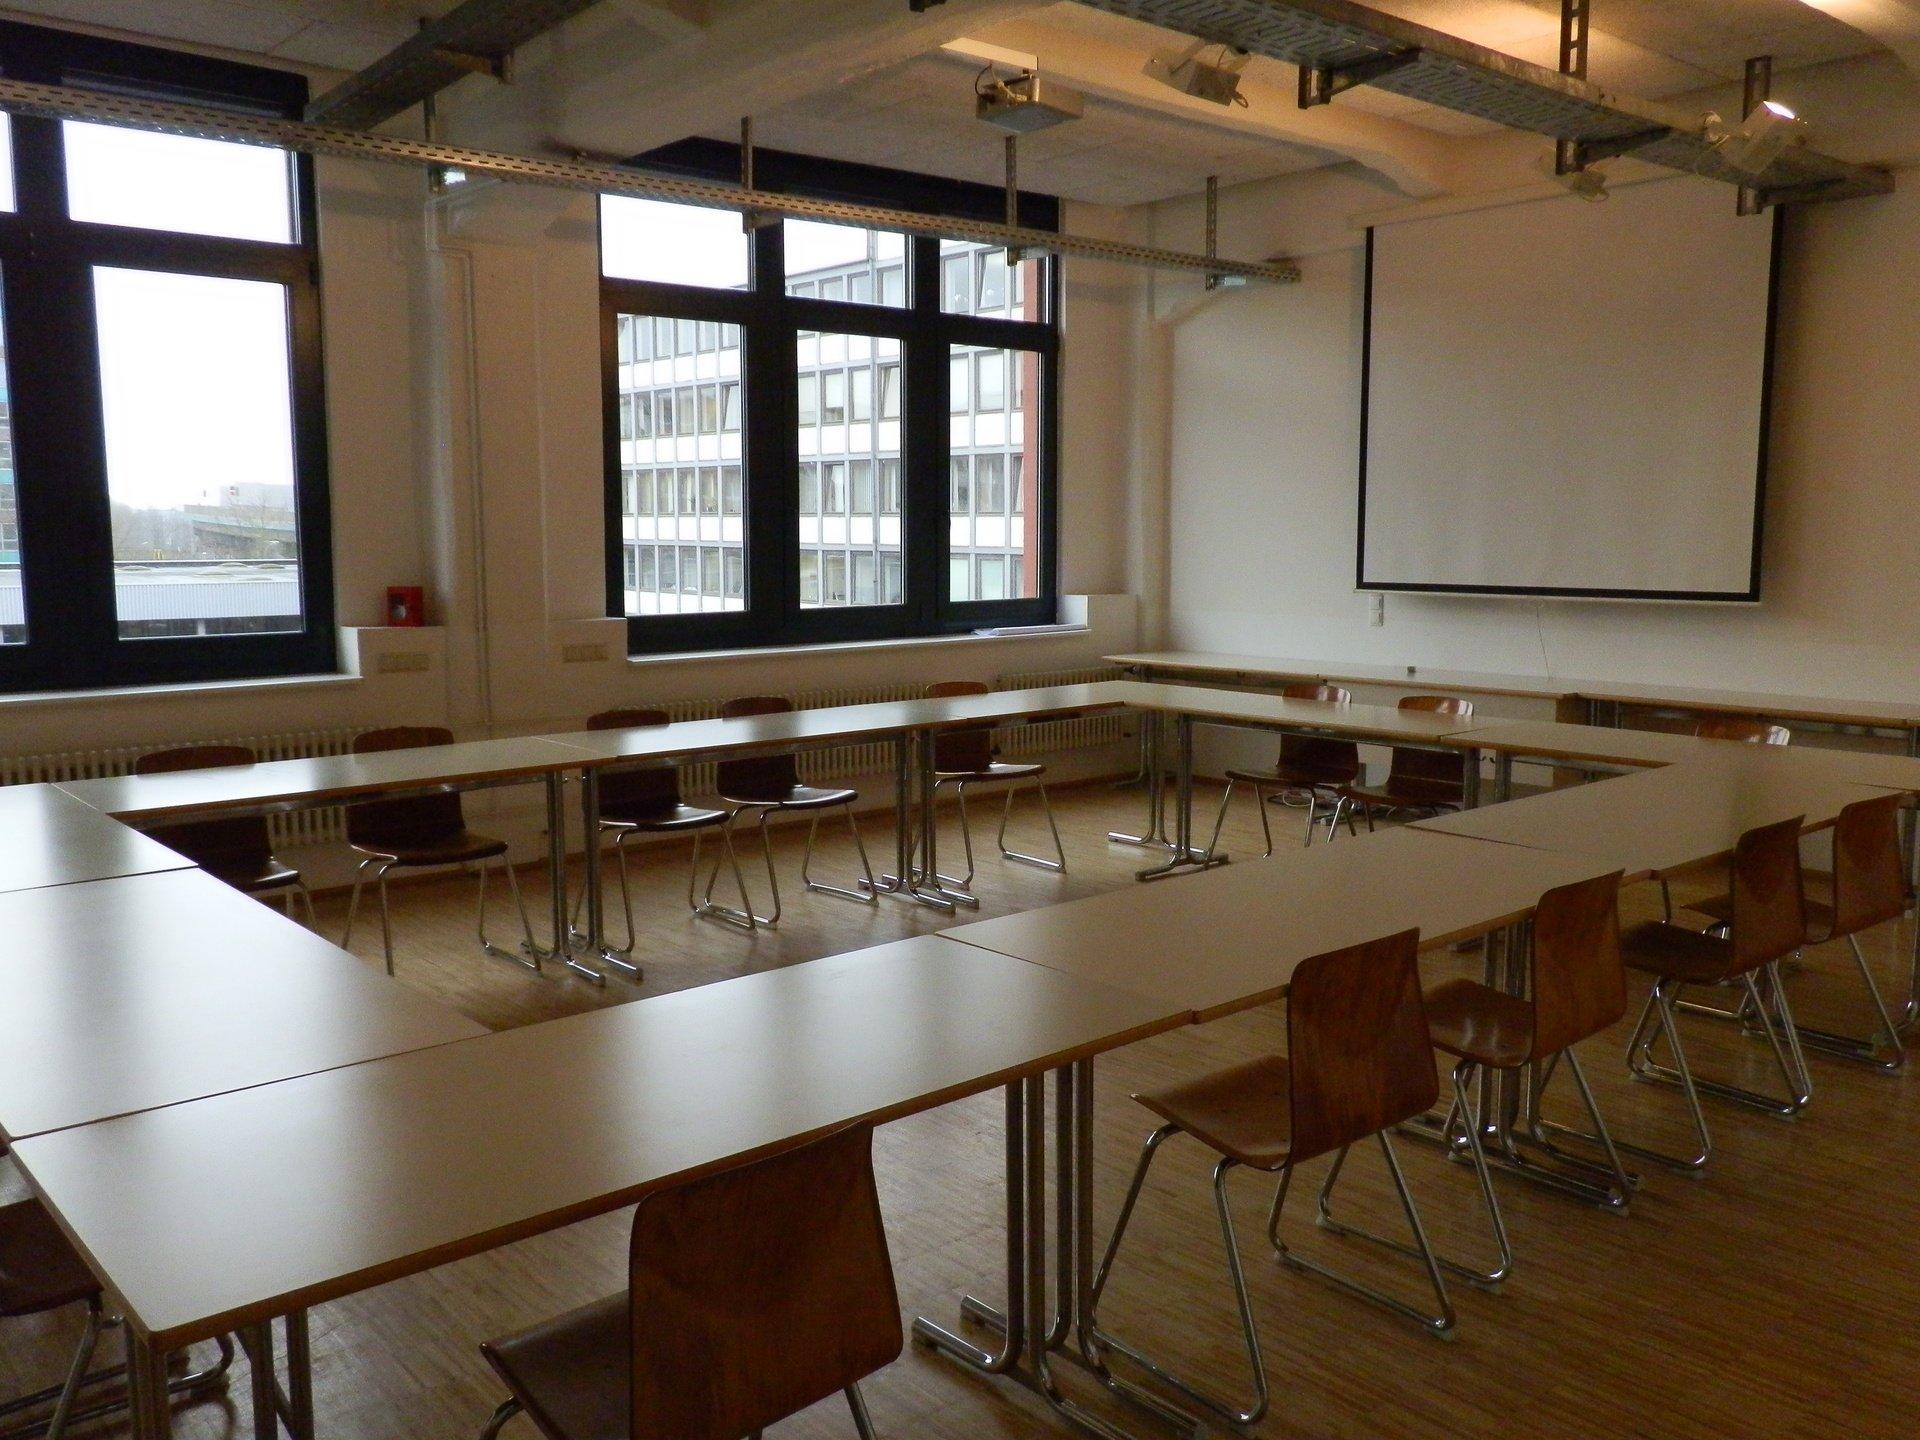 Hamburg seminar rooms Salle de réunion Texterschmiede small room image 0